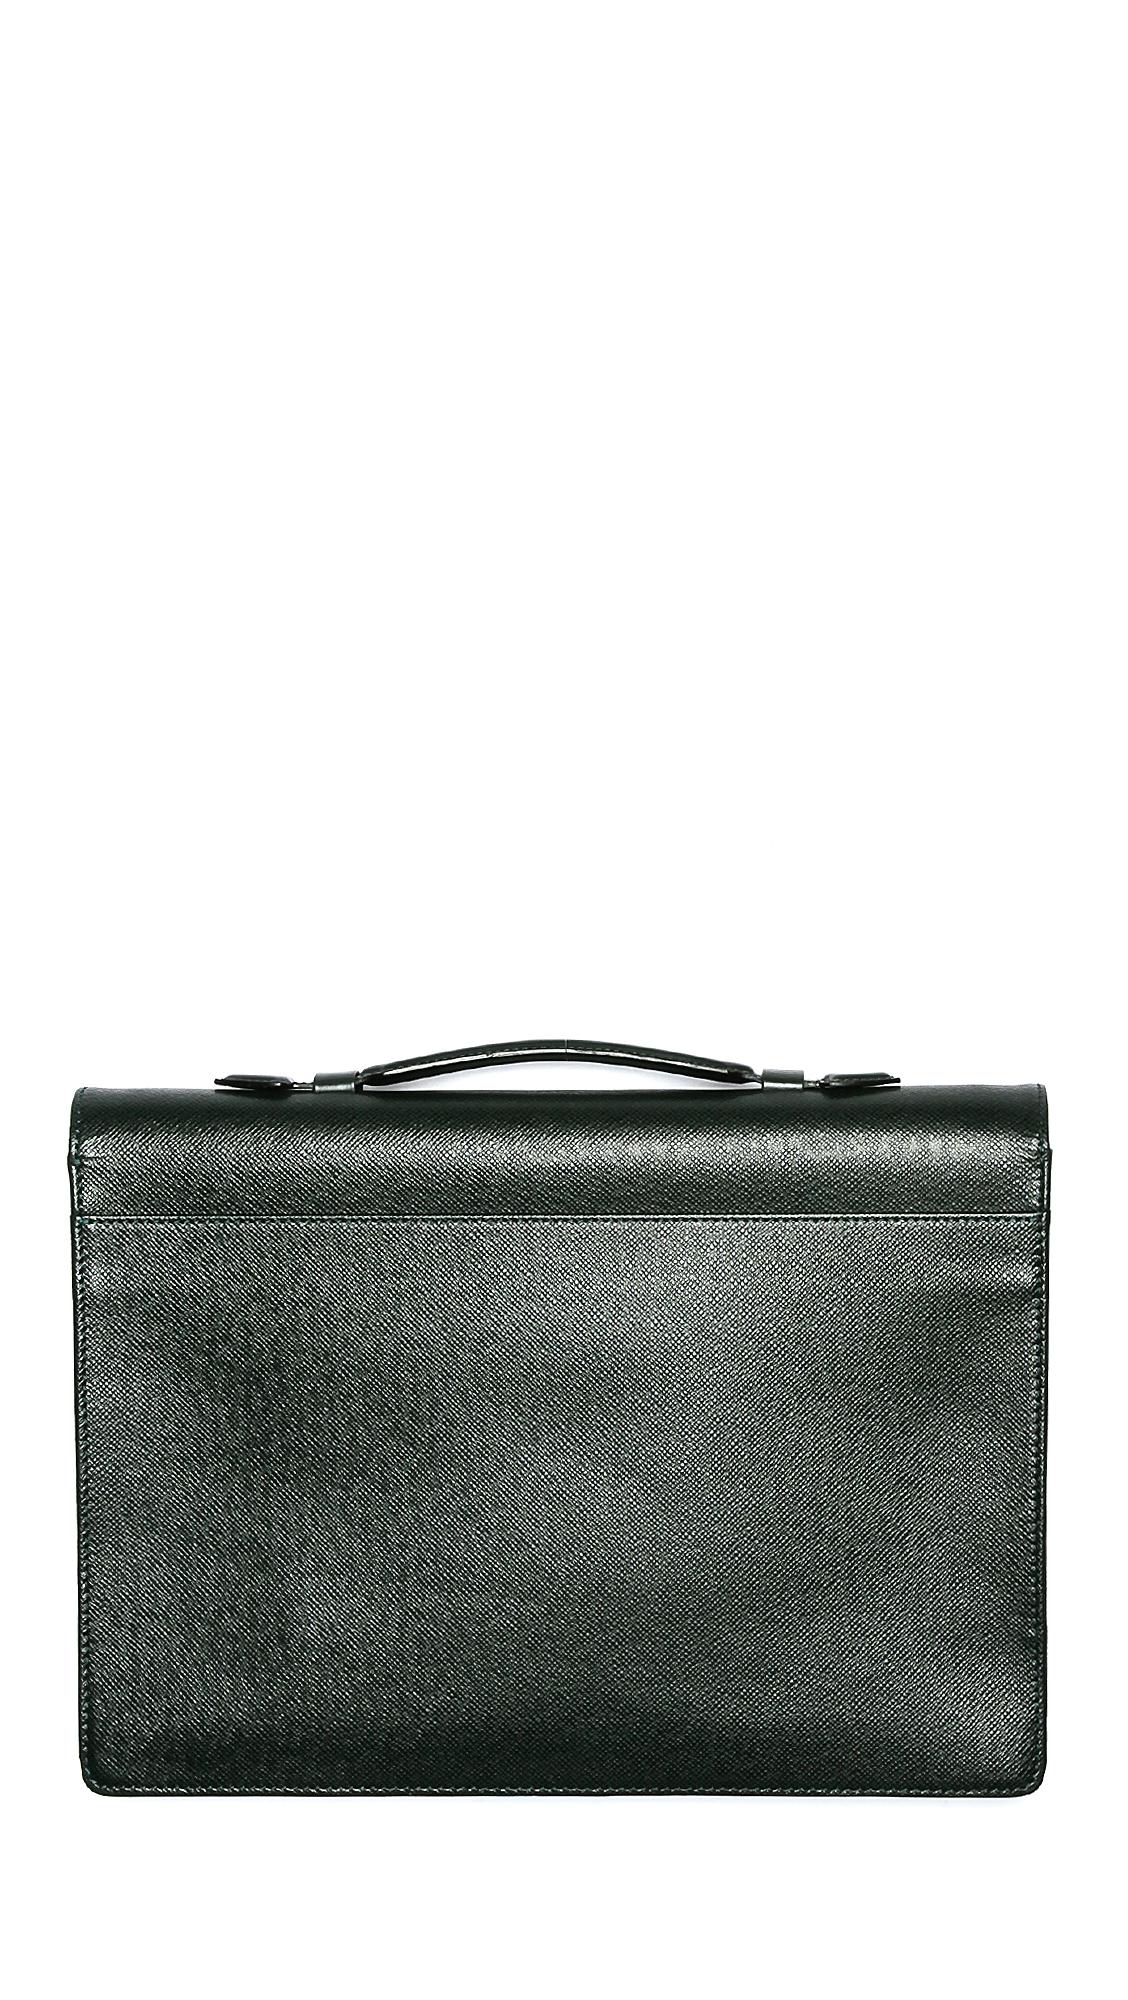 6cffa00e3ca0 WGACA Vintage Vintage Louis Vuitton Taiga Briefcase